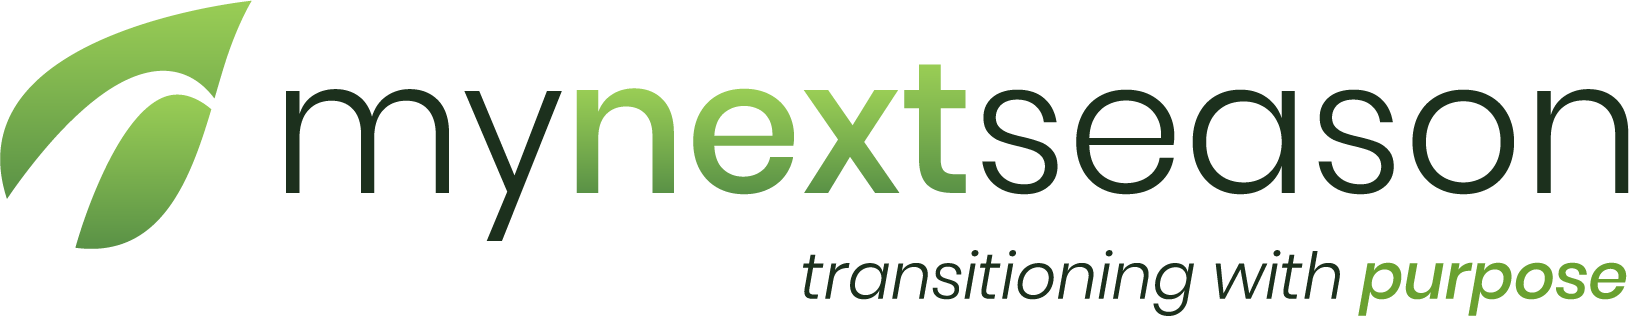 My Next Season Logo